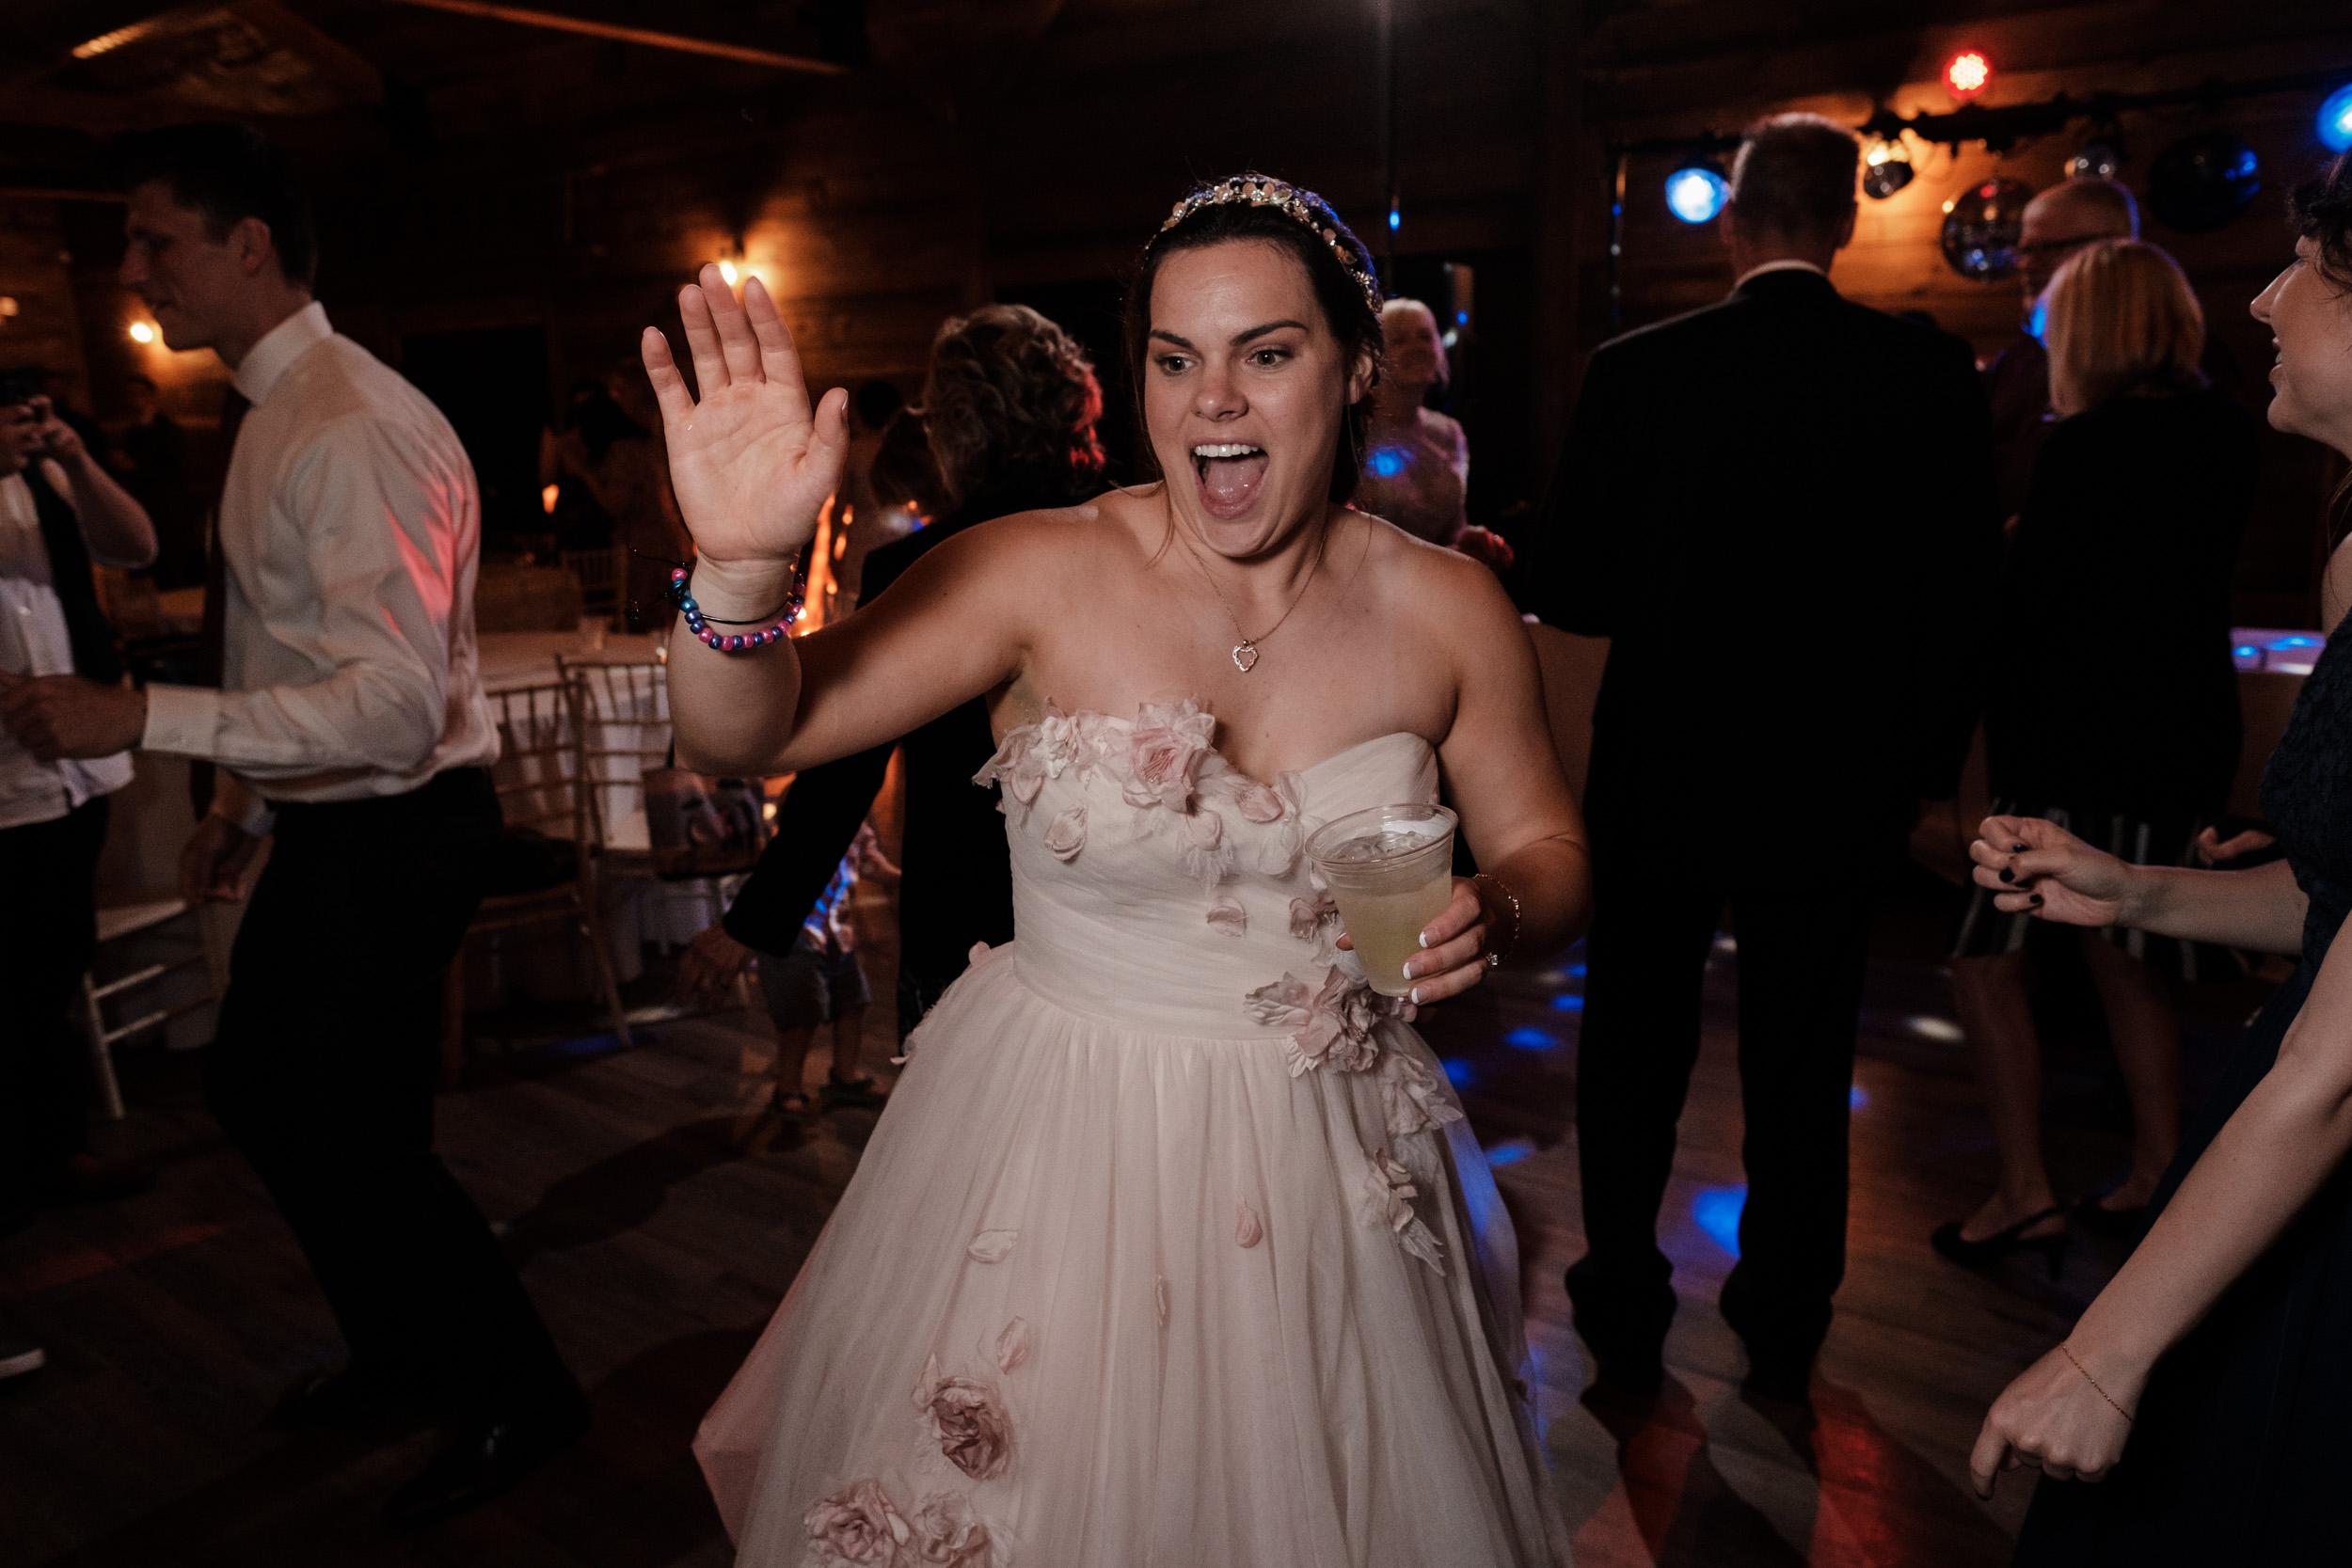 19-06-22-Ryan-Katie-The-Fields-Reserve-Wedding-84.jpg